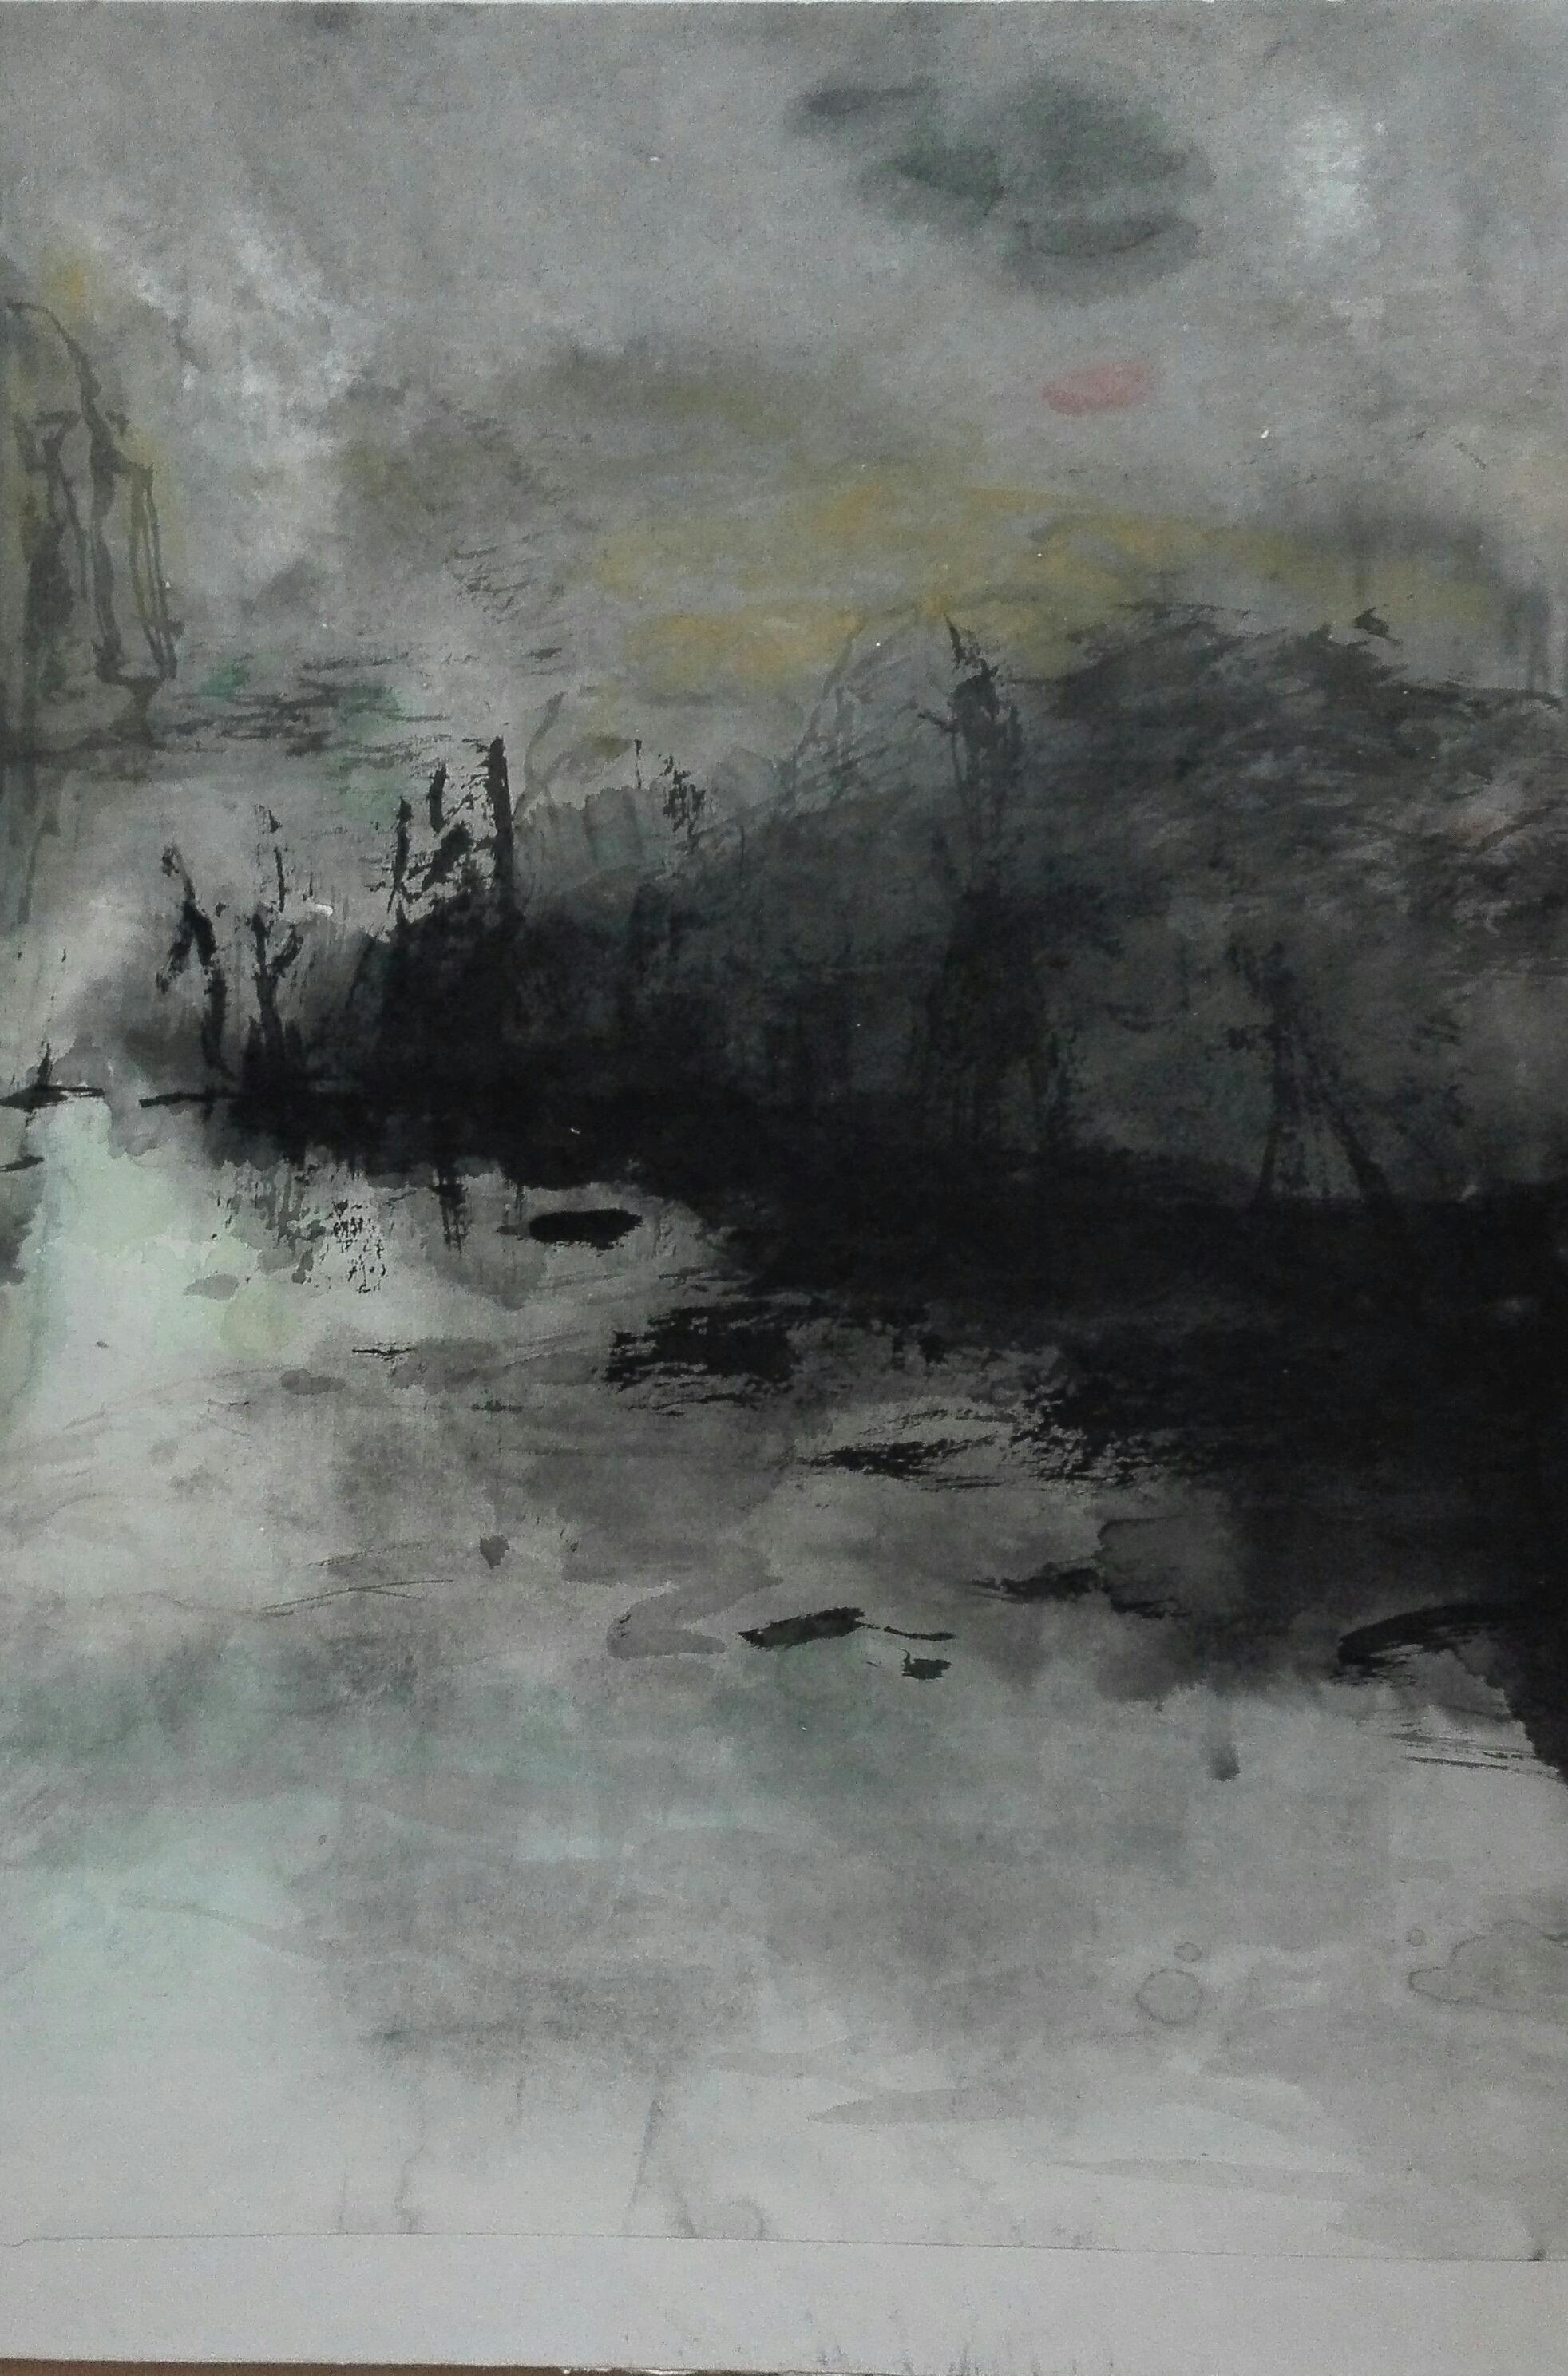 2005..小河边_paysage_d_un_fleuve_____________Encre_sur_papier__49x35